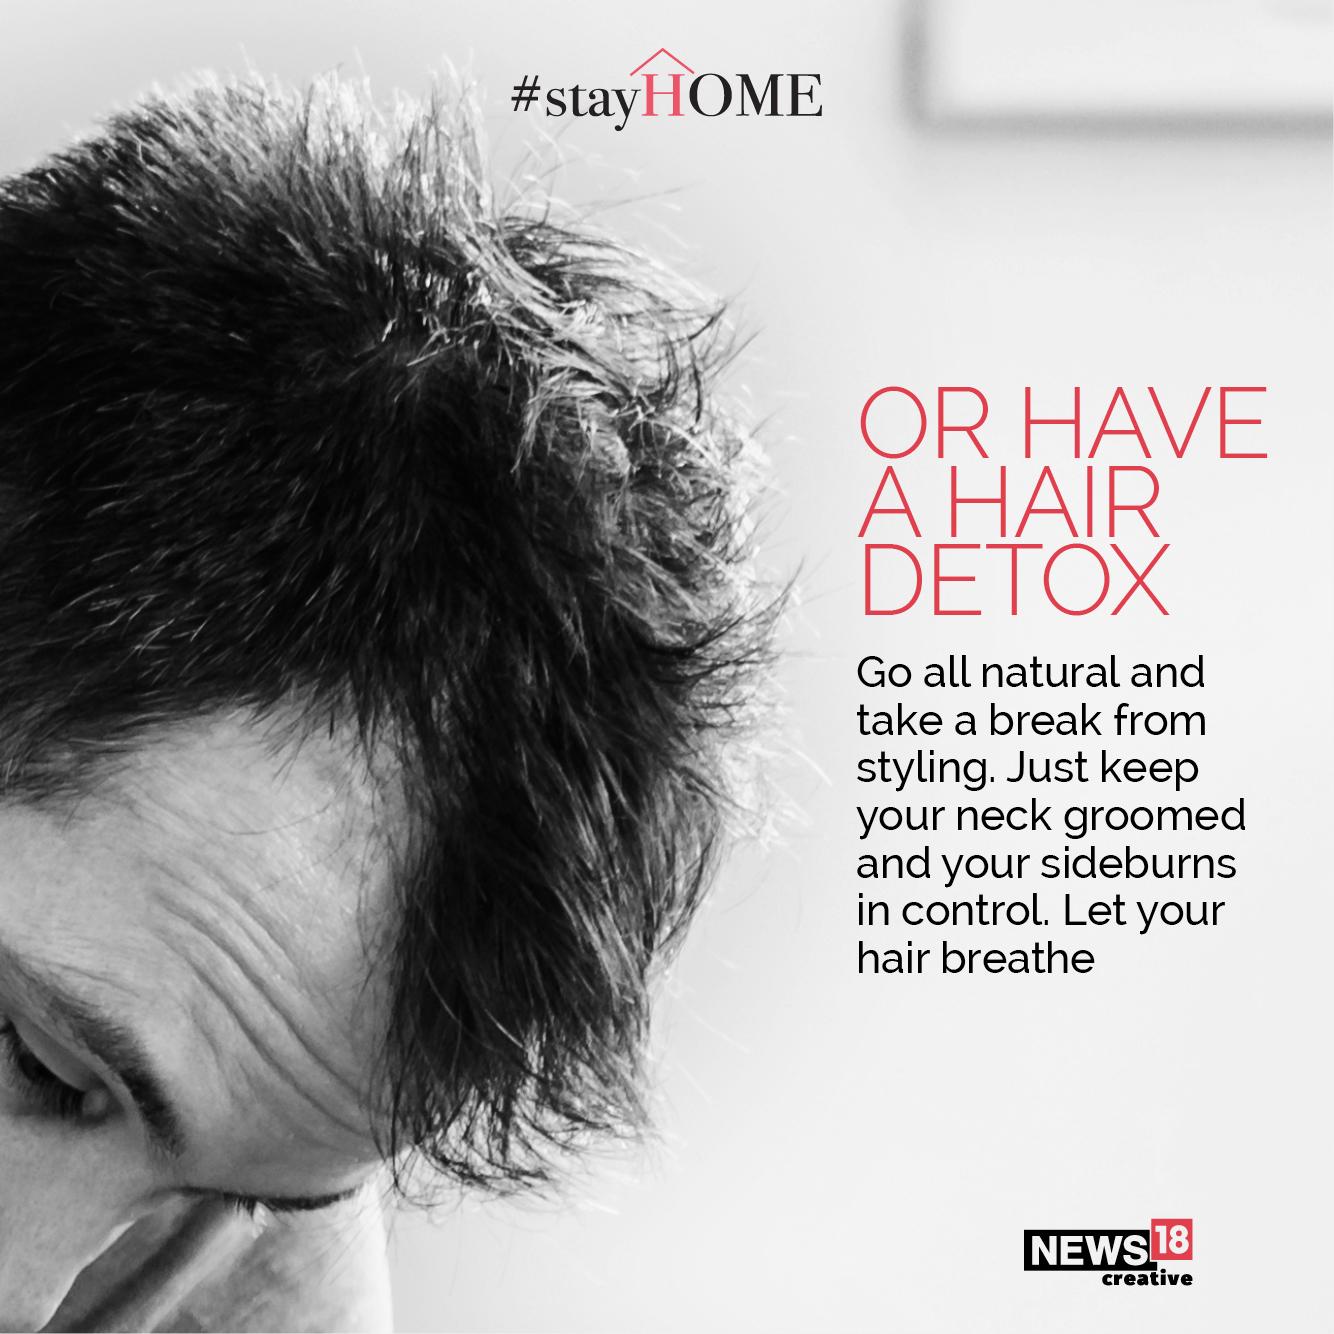 Tip 7 Have a hair detox (Image: News18 Creative)